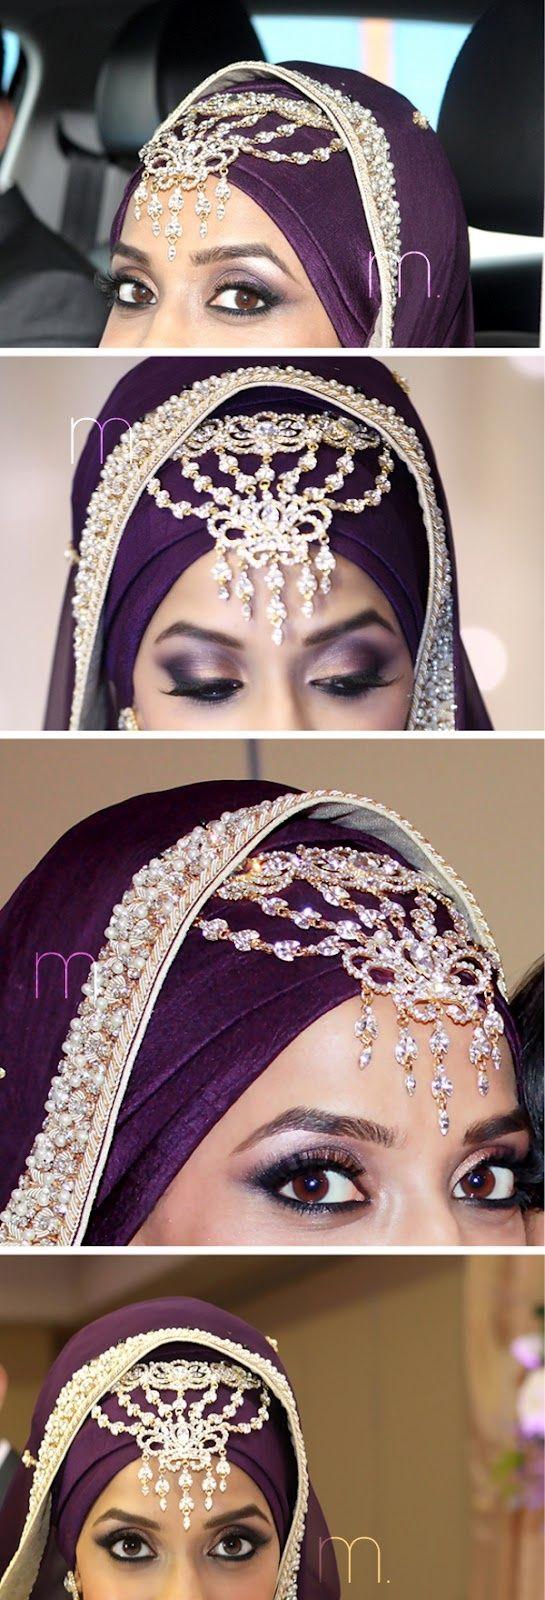 Cool Muslim Wedding Dresses mmi style: Bridal Inspiration Check more at http://24myshop.ml/my-desires/muslim-wedding-dresses-mmi-style-bridal-inspiration/